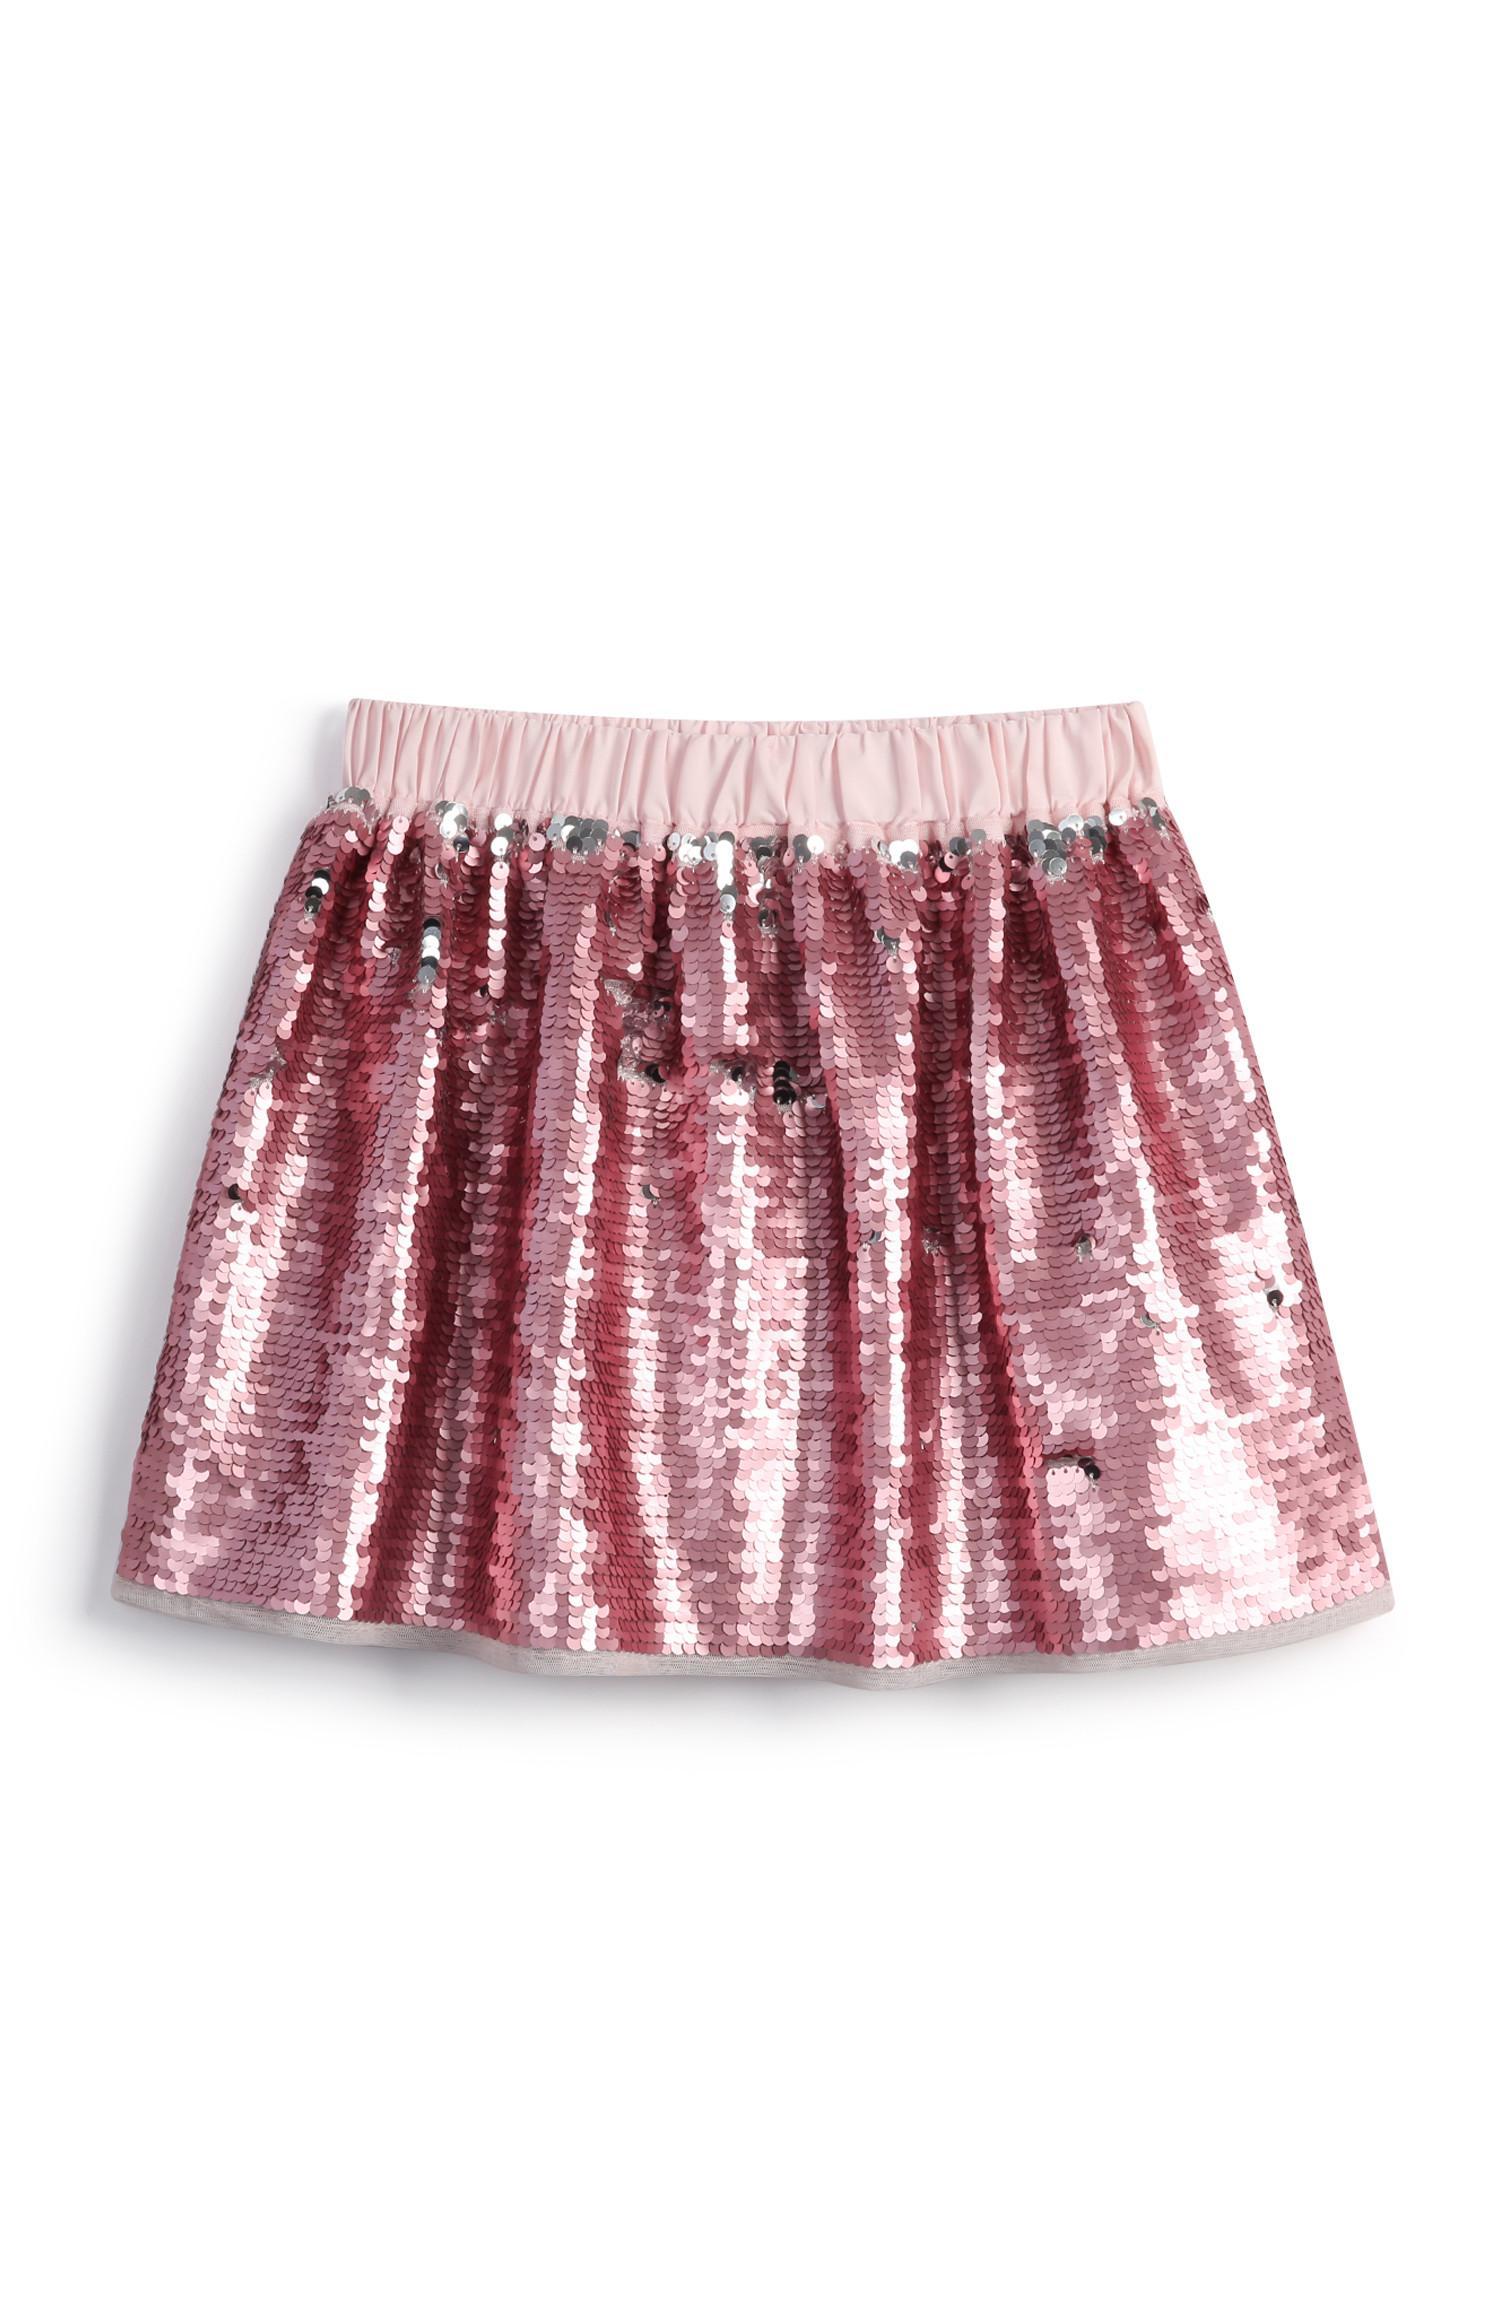 Gonna rosa con paillettes da bambina